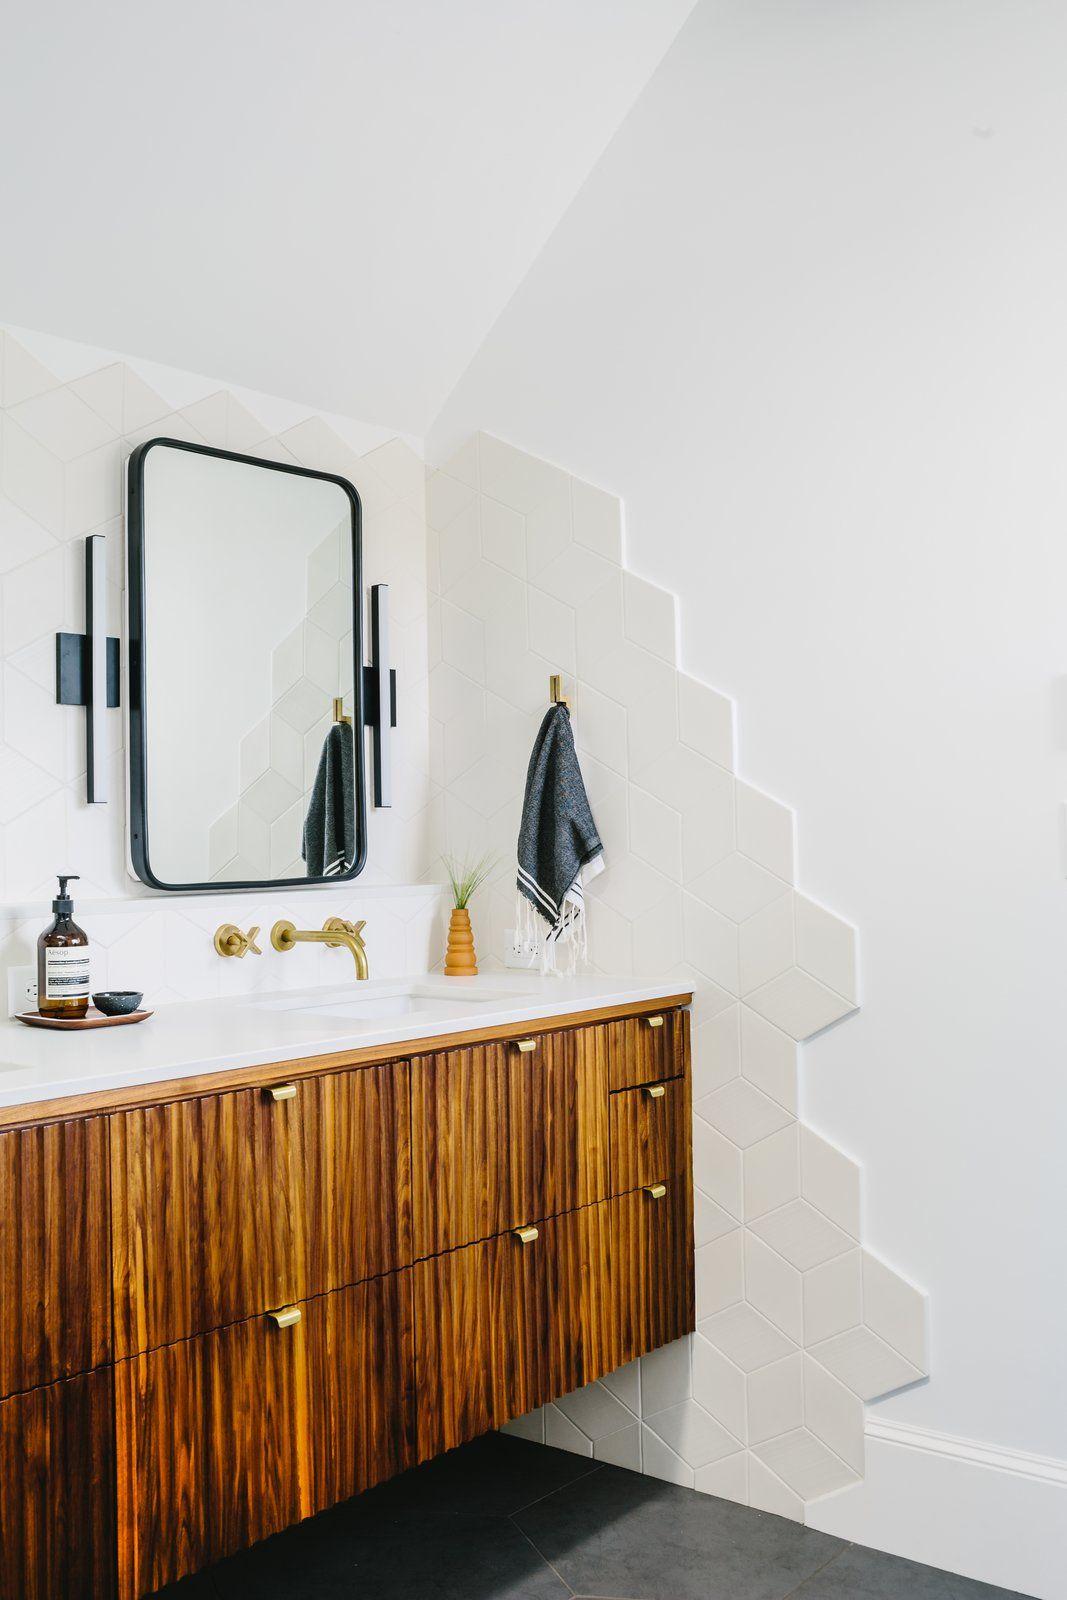 Modern Home With Bath Room Engineered Quartz Counter Porcelain